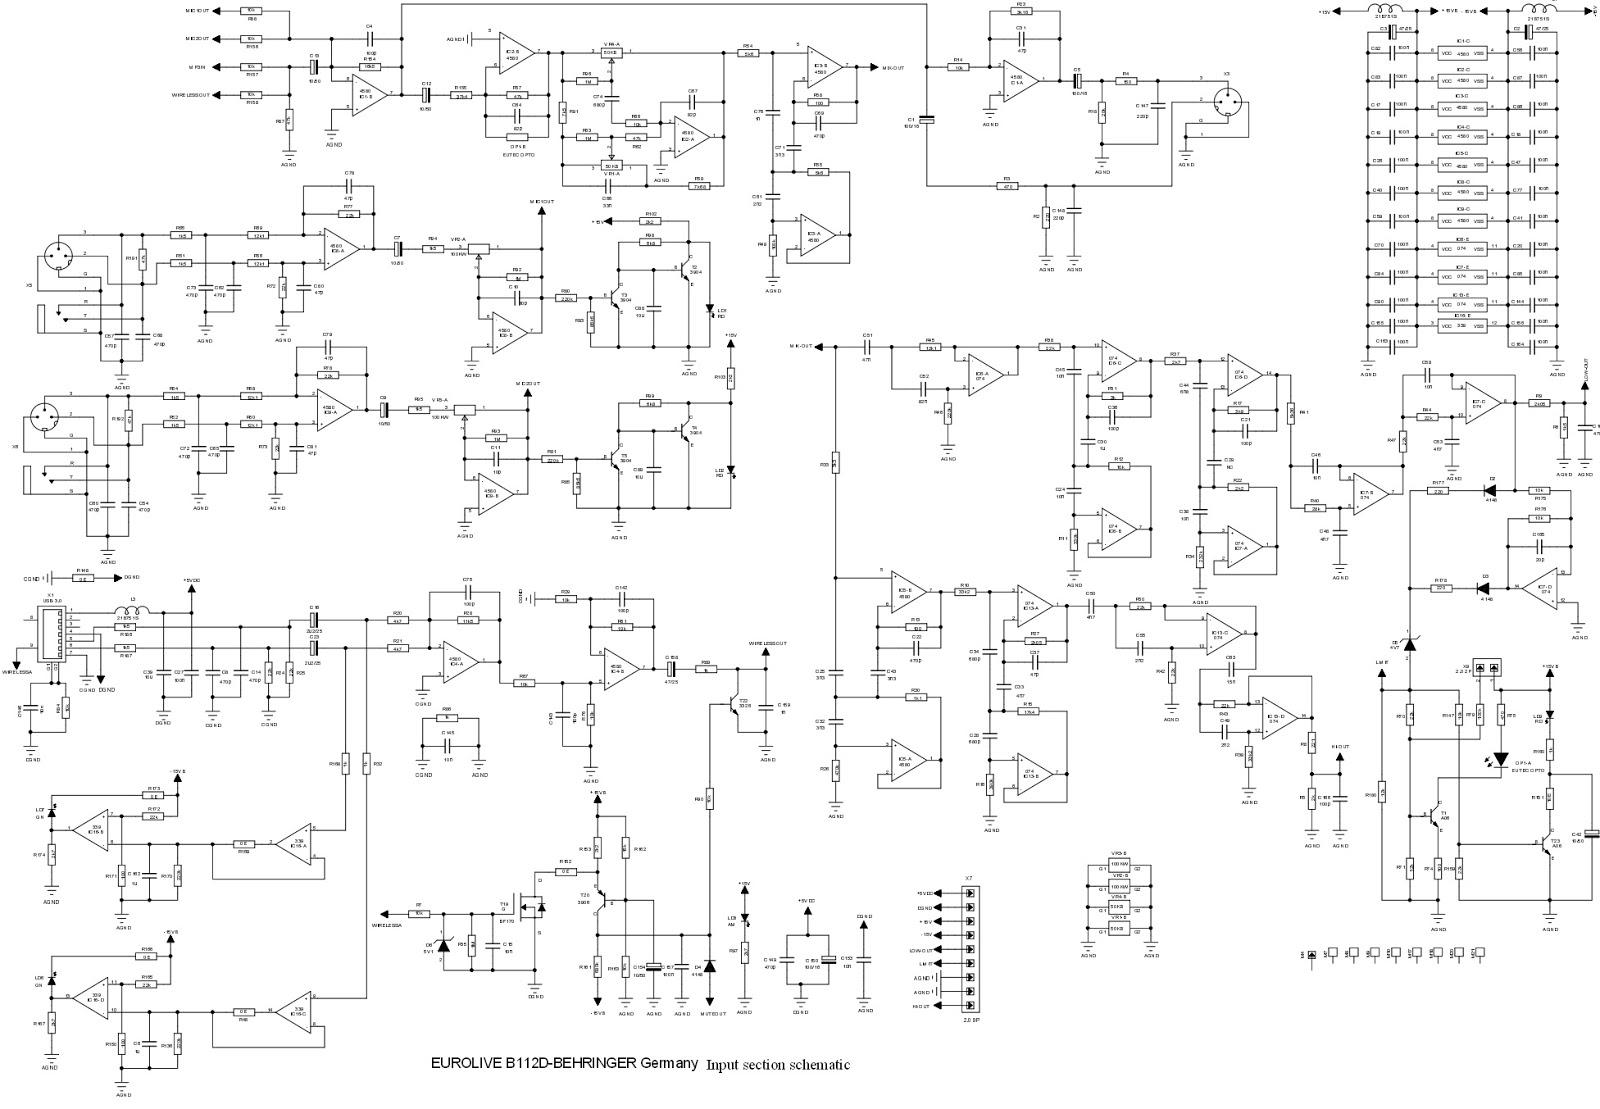 hight resolution of behringer pa system wiring diagram pa system setup diagram pa pa eurolive b112d behringer germany